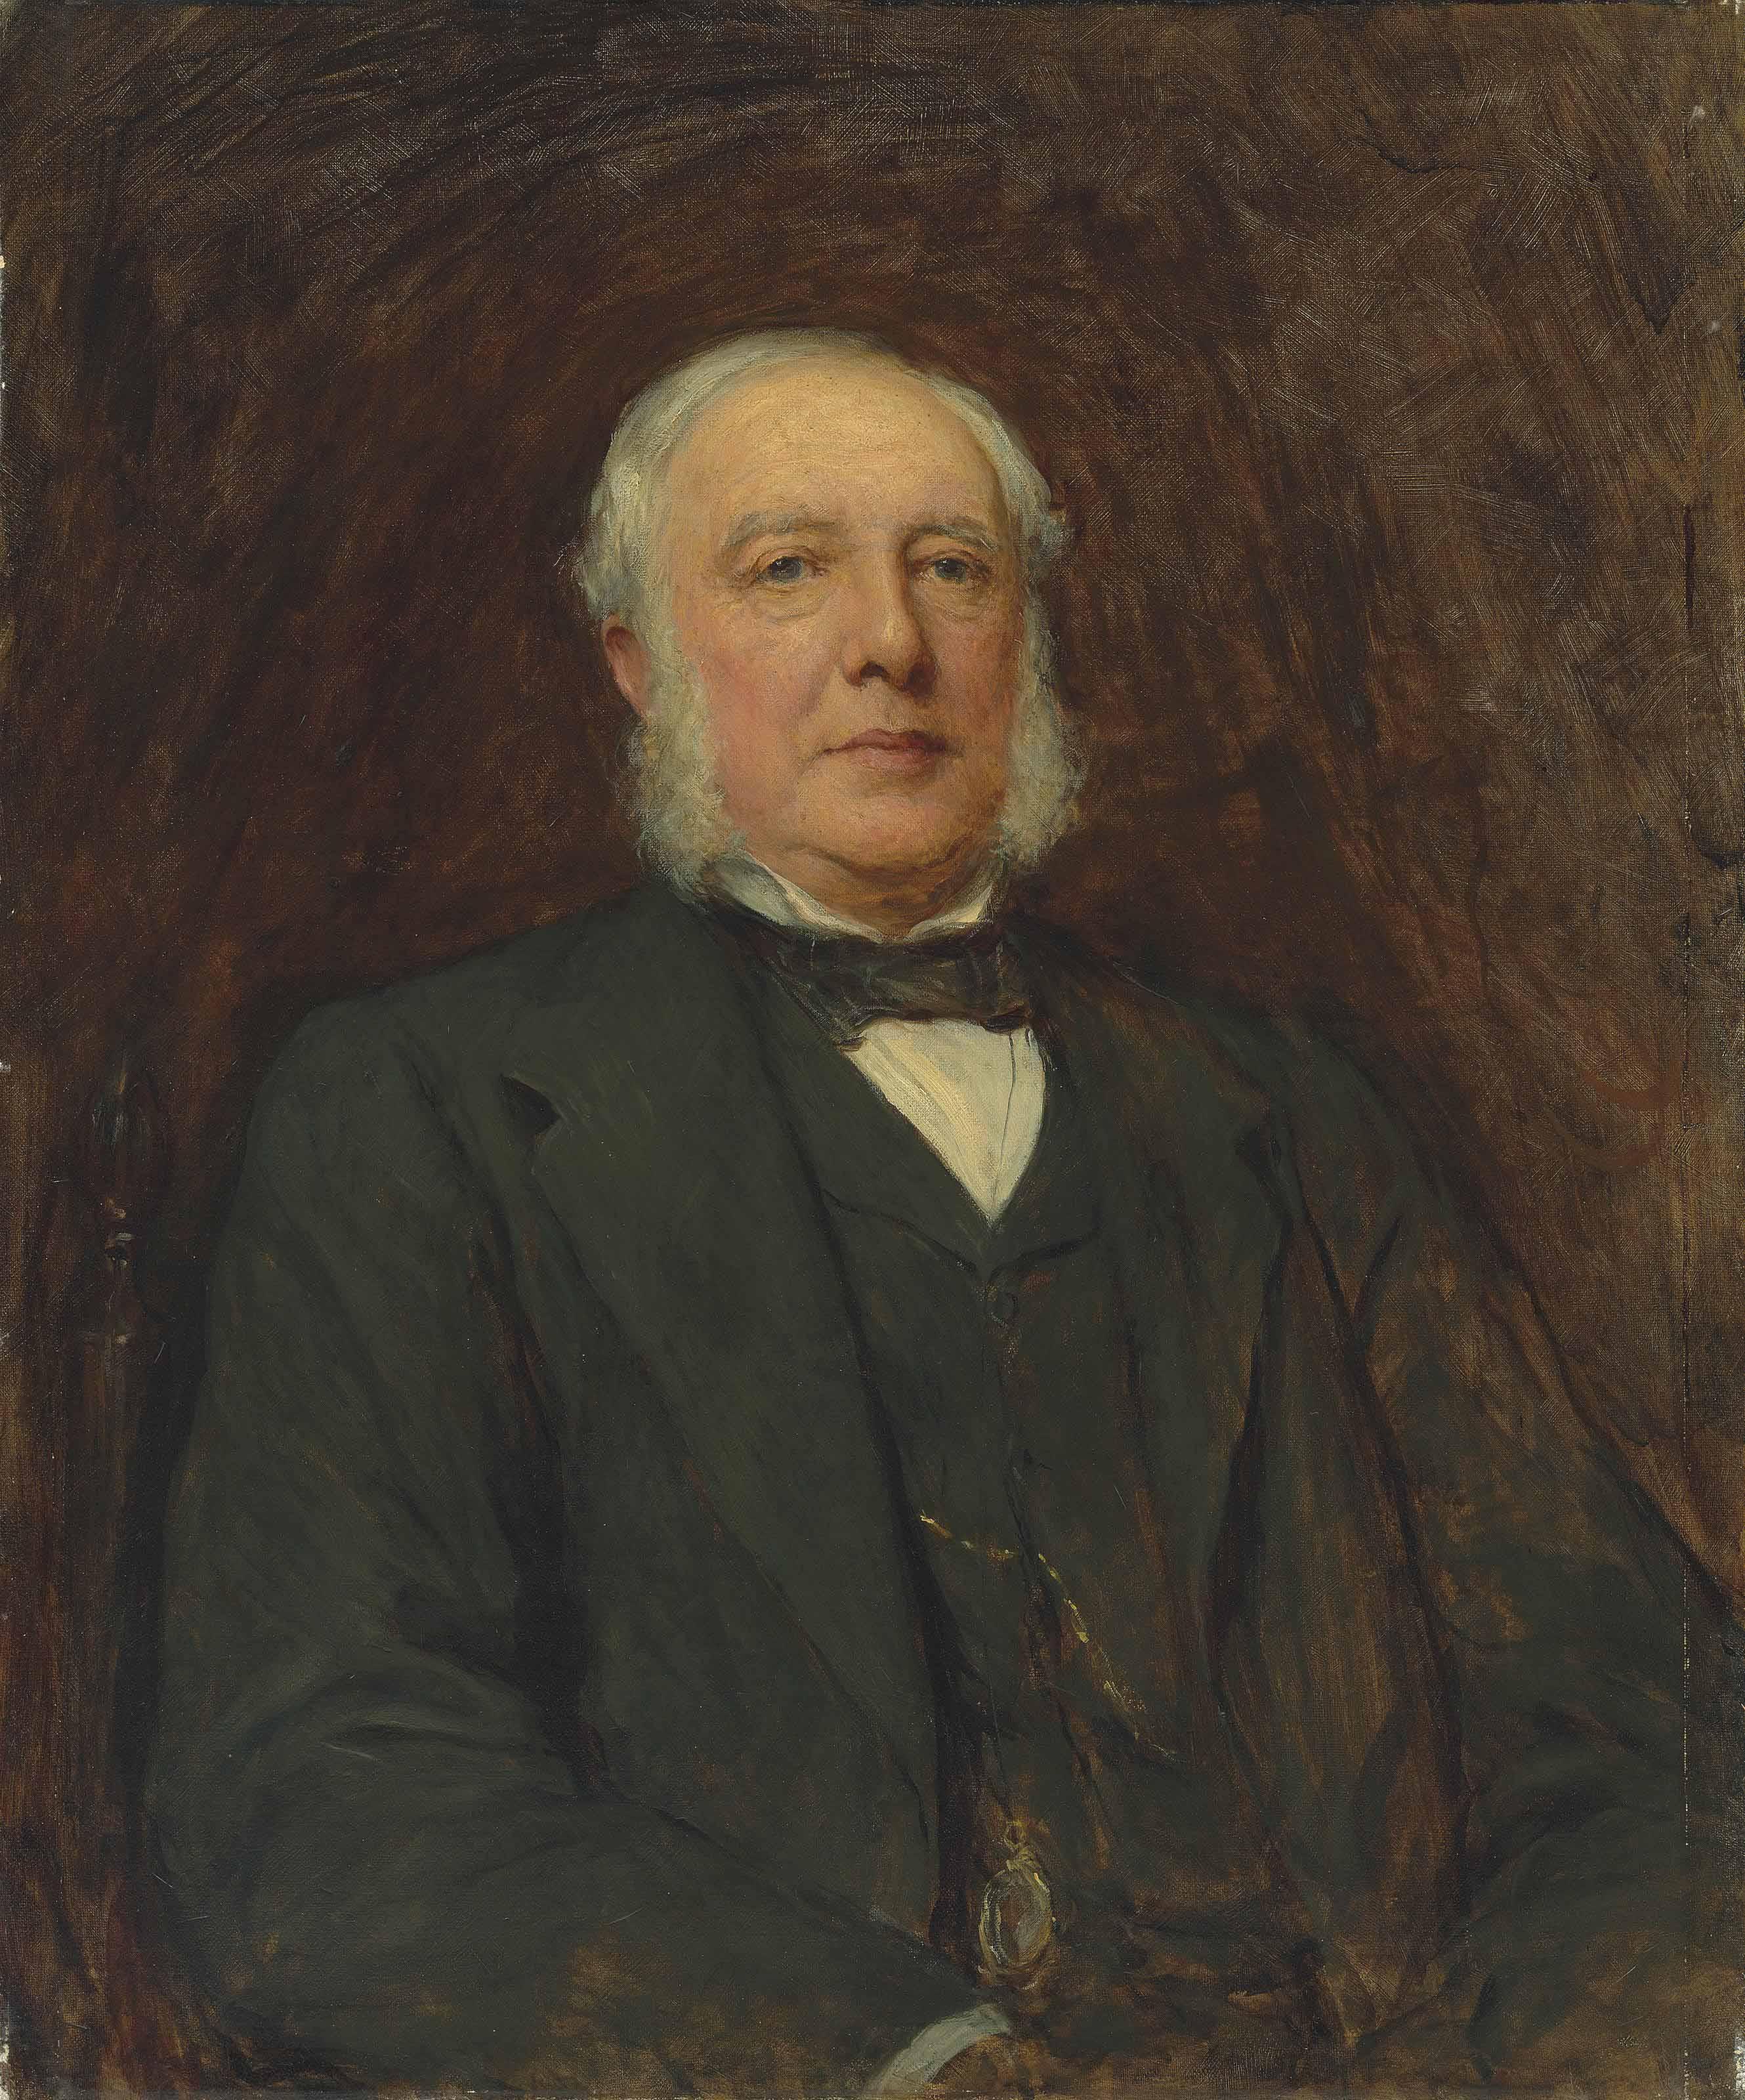 Portrait of Sir William Agnew, 1st Bt. (1825-1910)